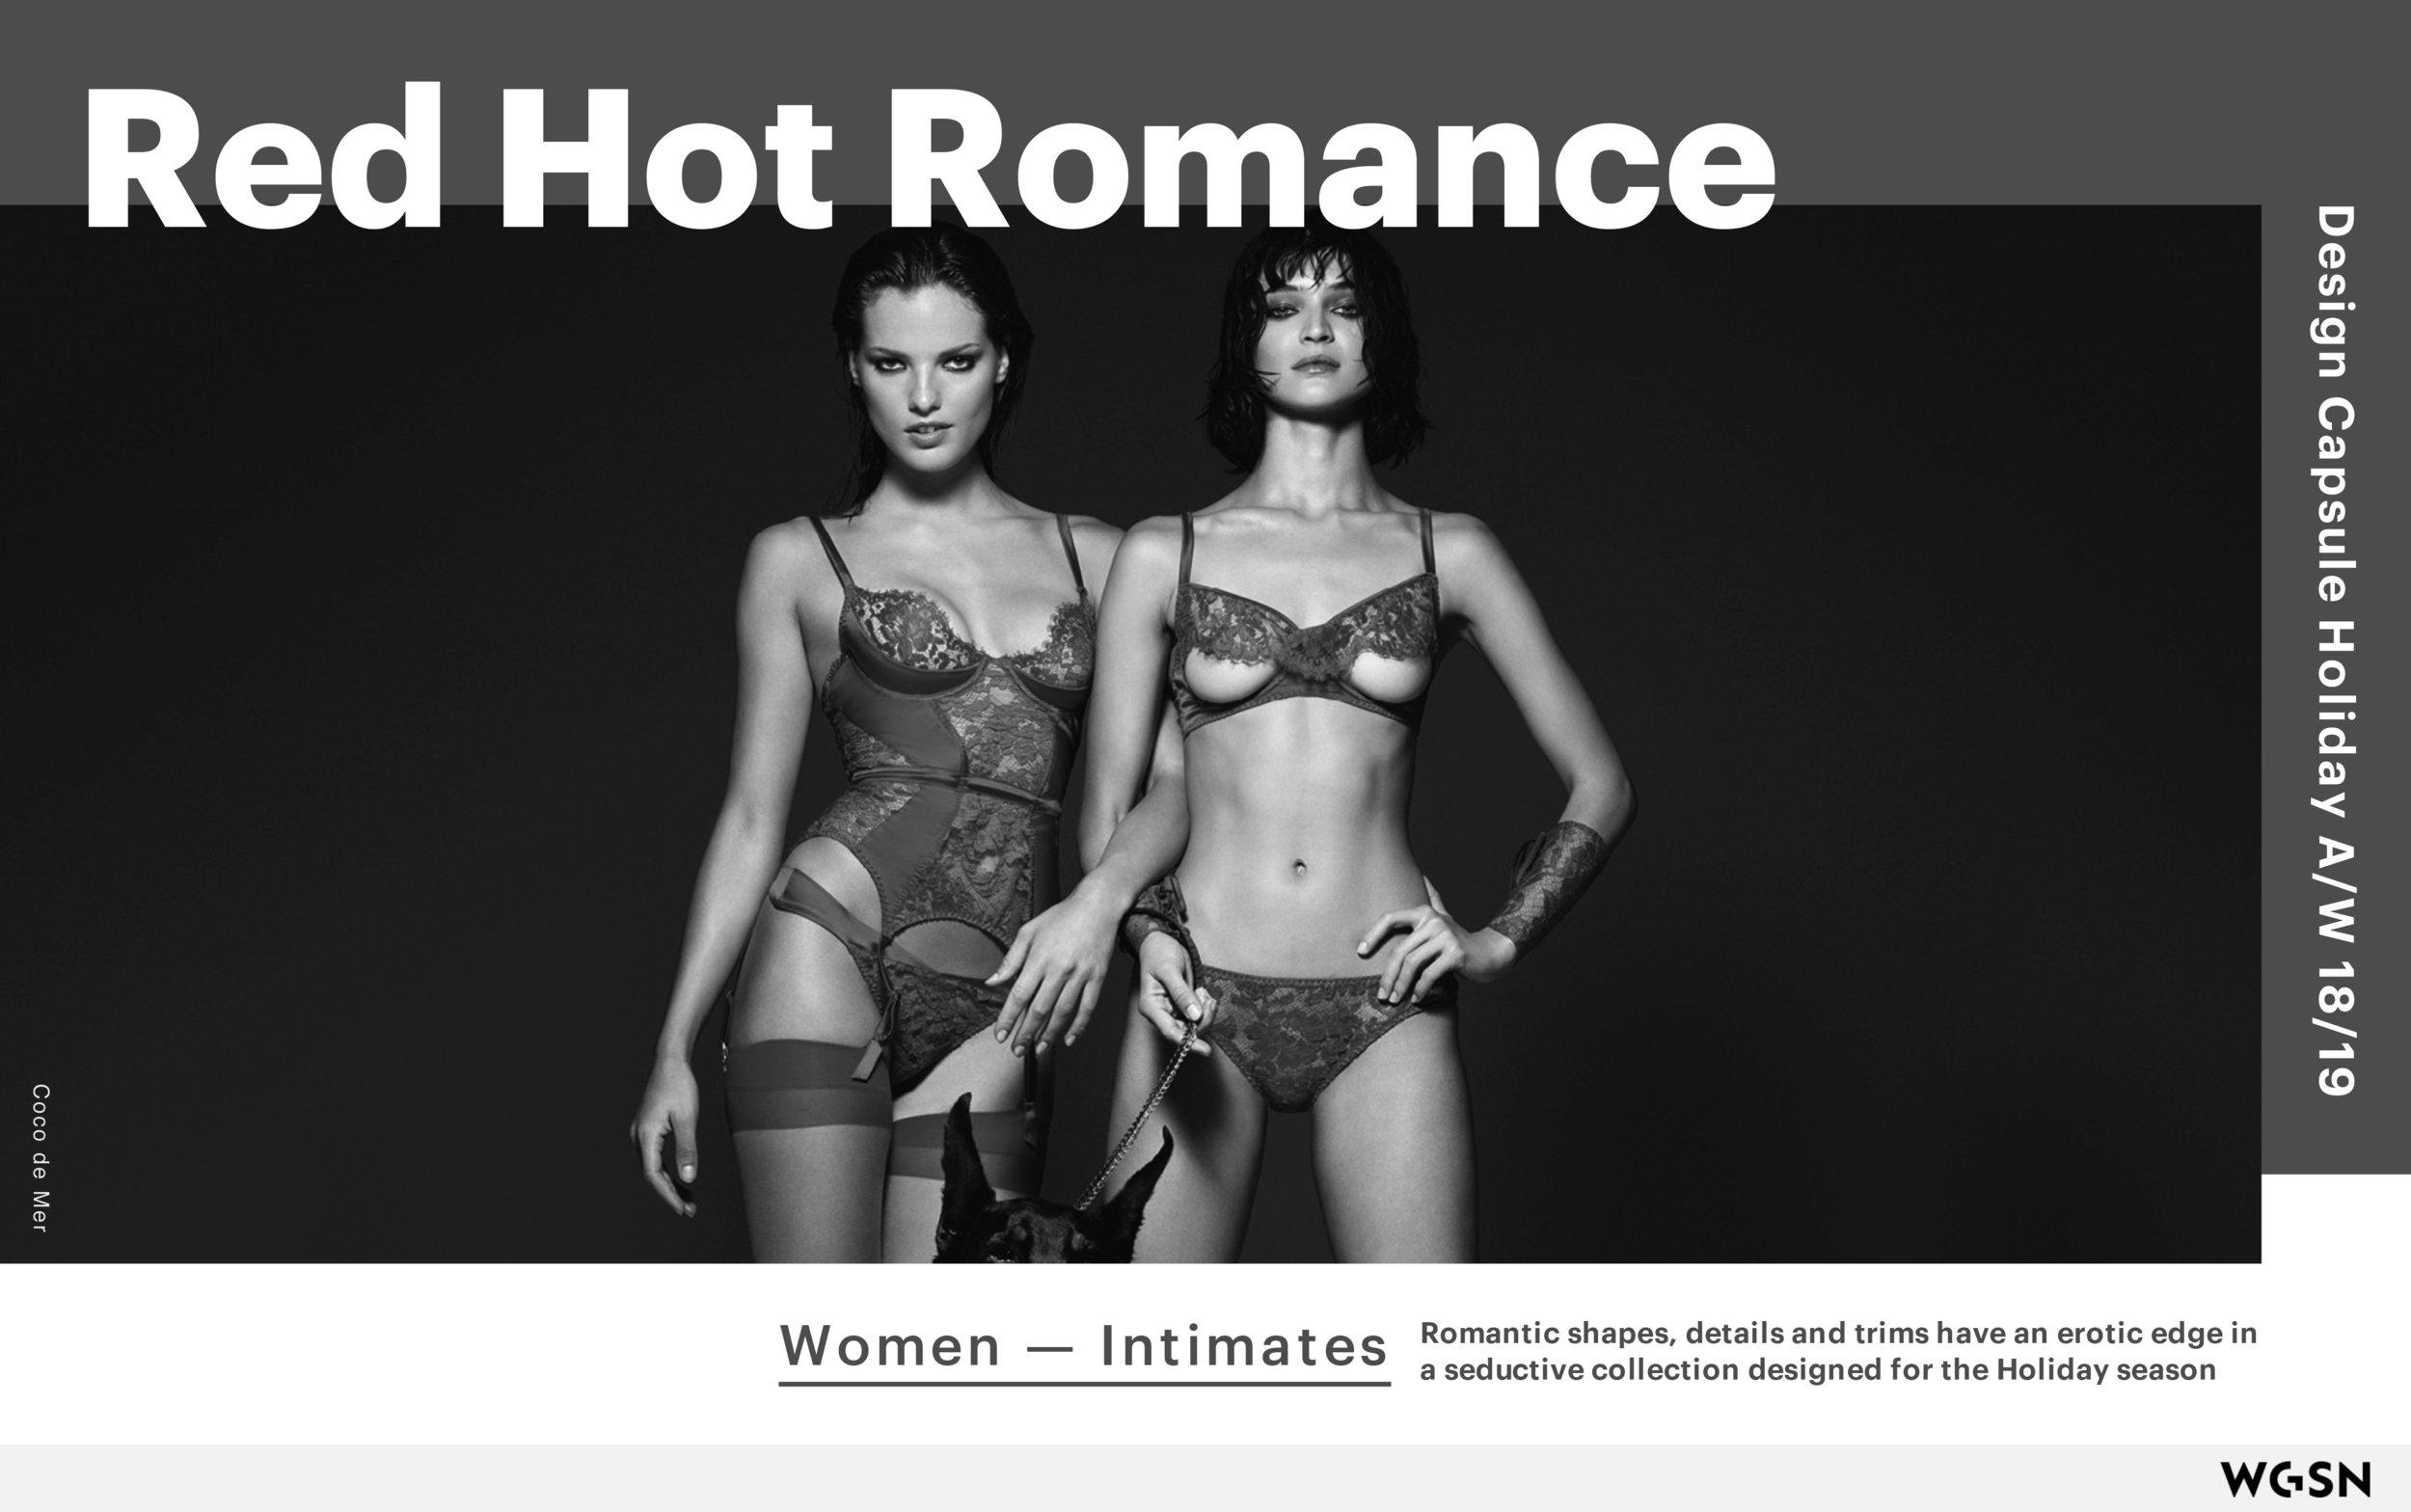 1. Red_Hot_Romance_–_Holiday_A_W_18_19_Intimates_Design_Capsule-1IMAVANDEVEN-JOLYNCH.jpg